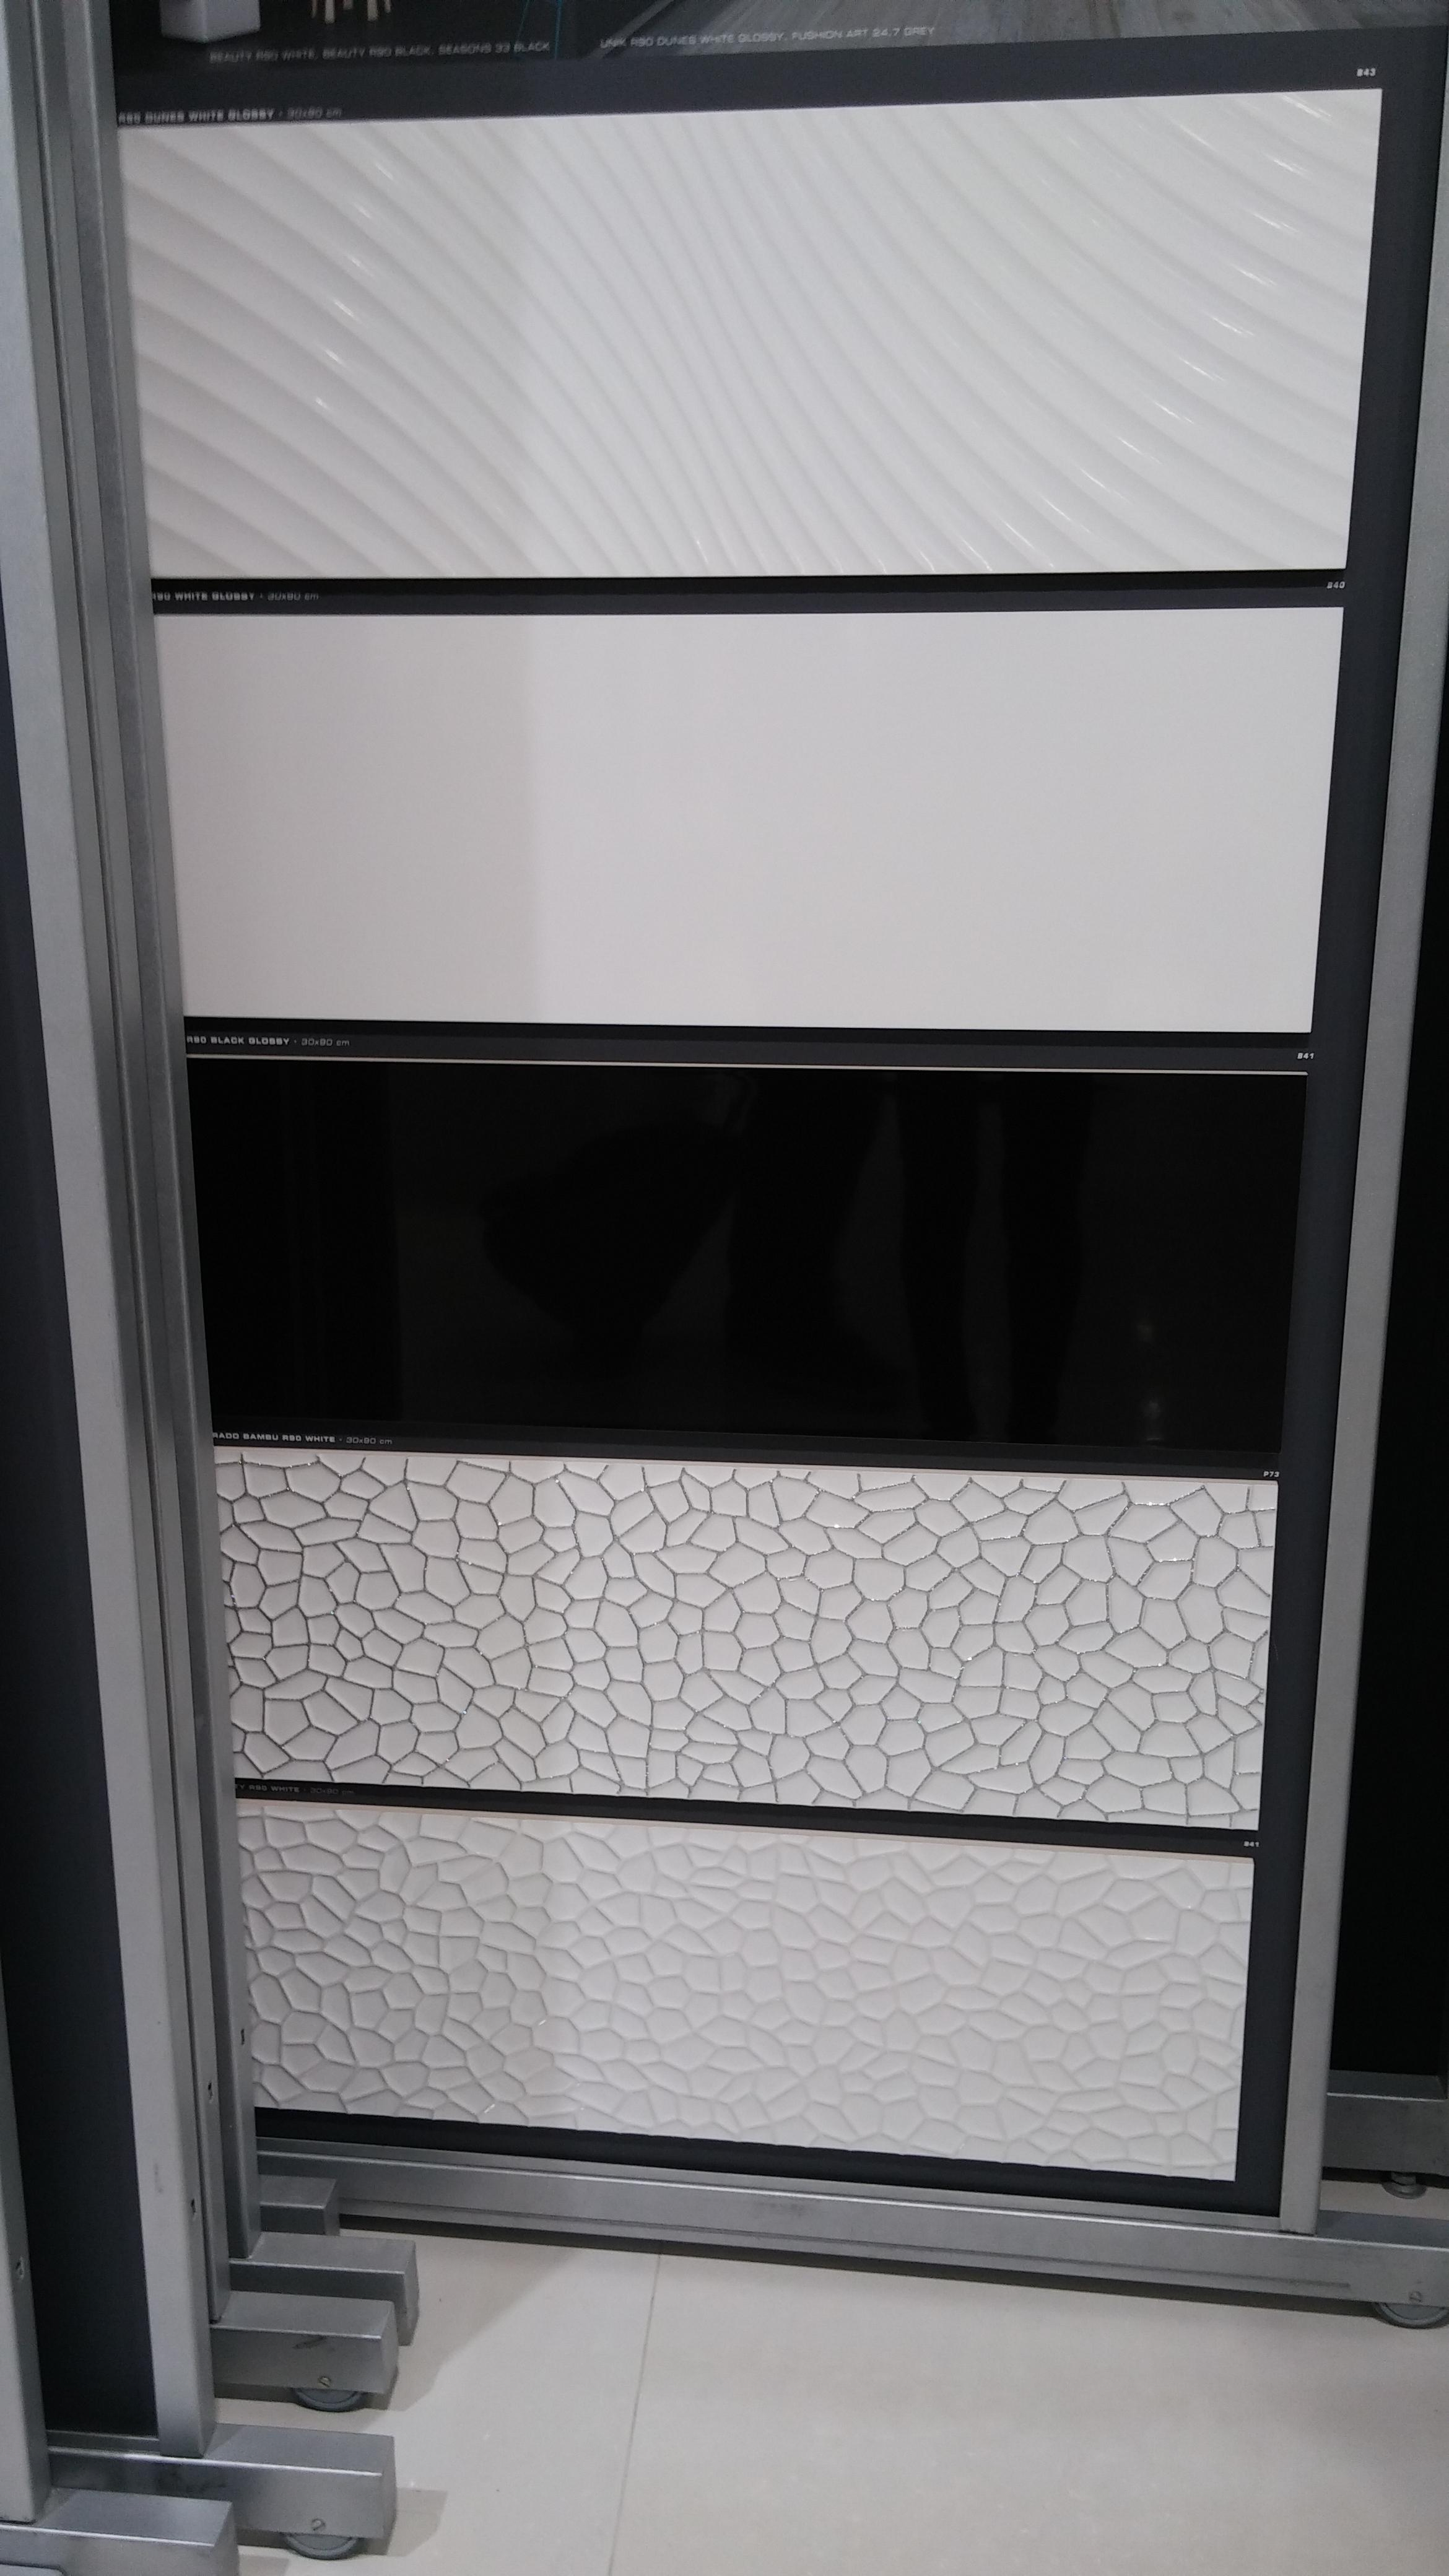 Novedades azulejos 2015 16 tino jornet - Azulejo negro ...